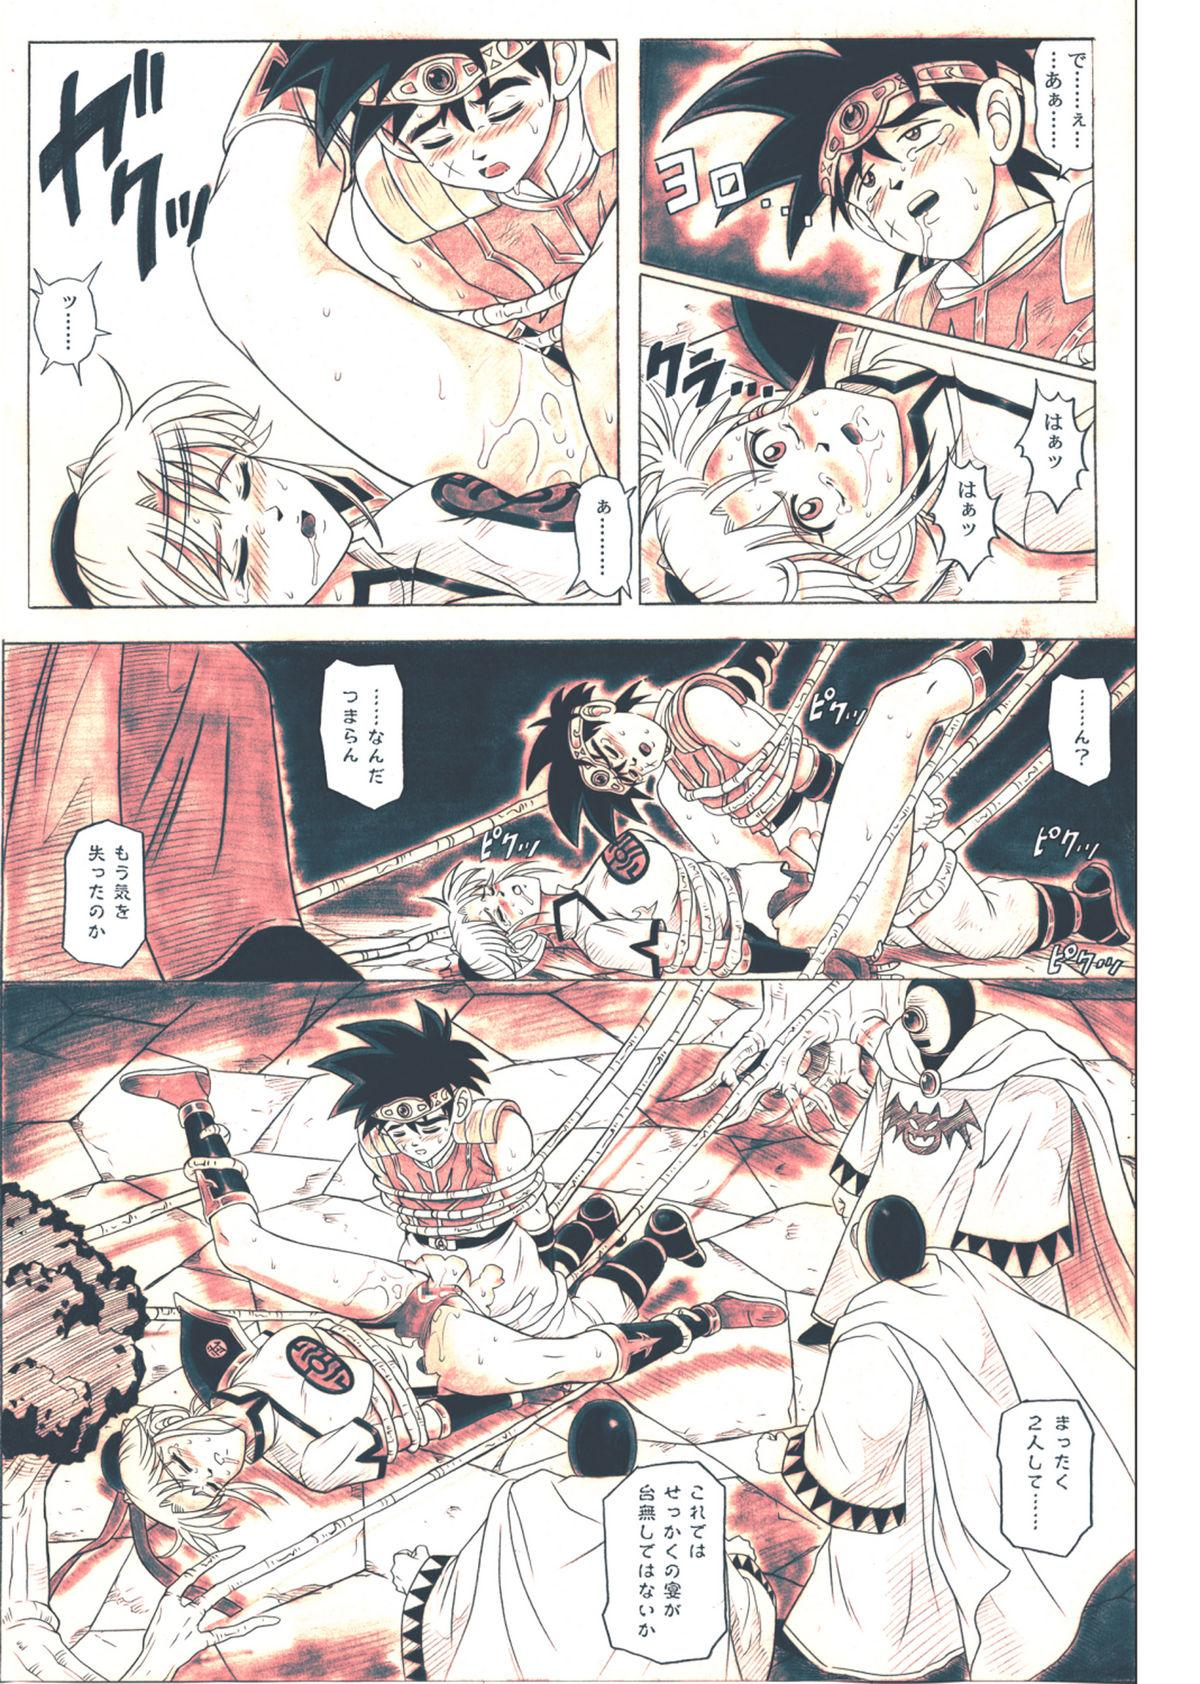 [Cyclone (Reizei, Izumi)] STAR TAC IDO ~Youkuso Haja no Doukutsu he~ Chuuhen Download edition (Dragon Warrior: Dai's Great Adventure) [Digital] 112